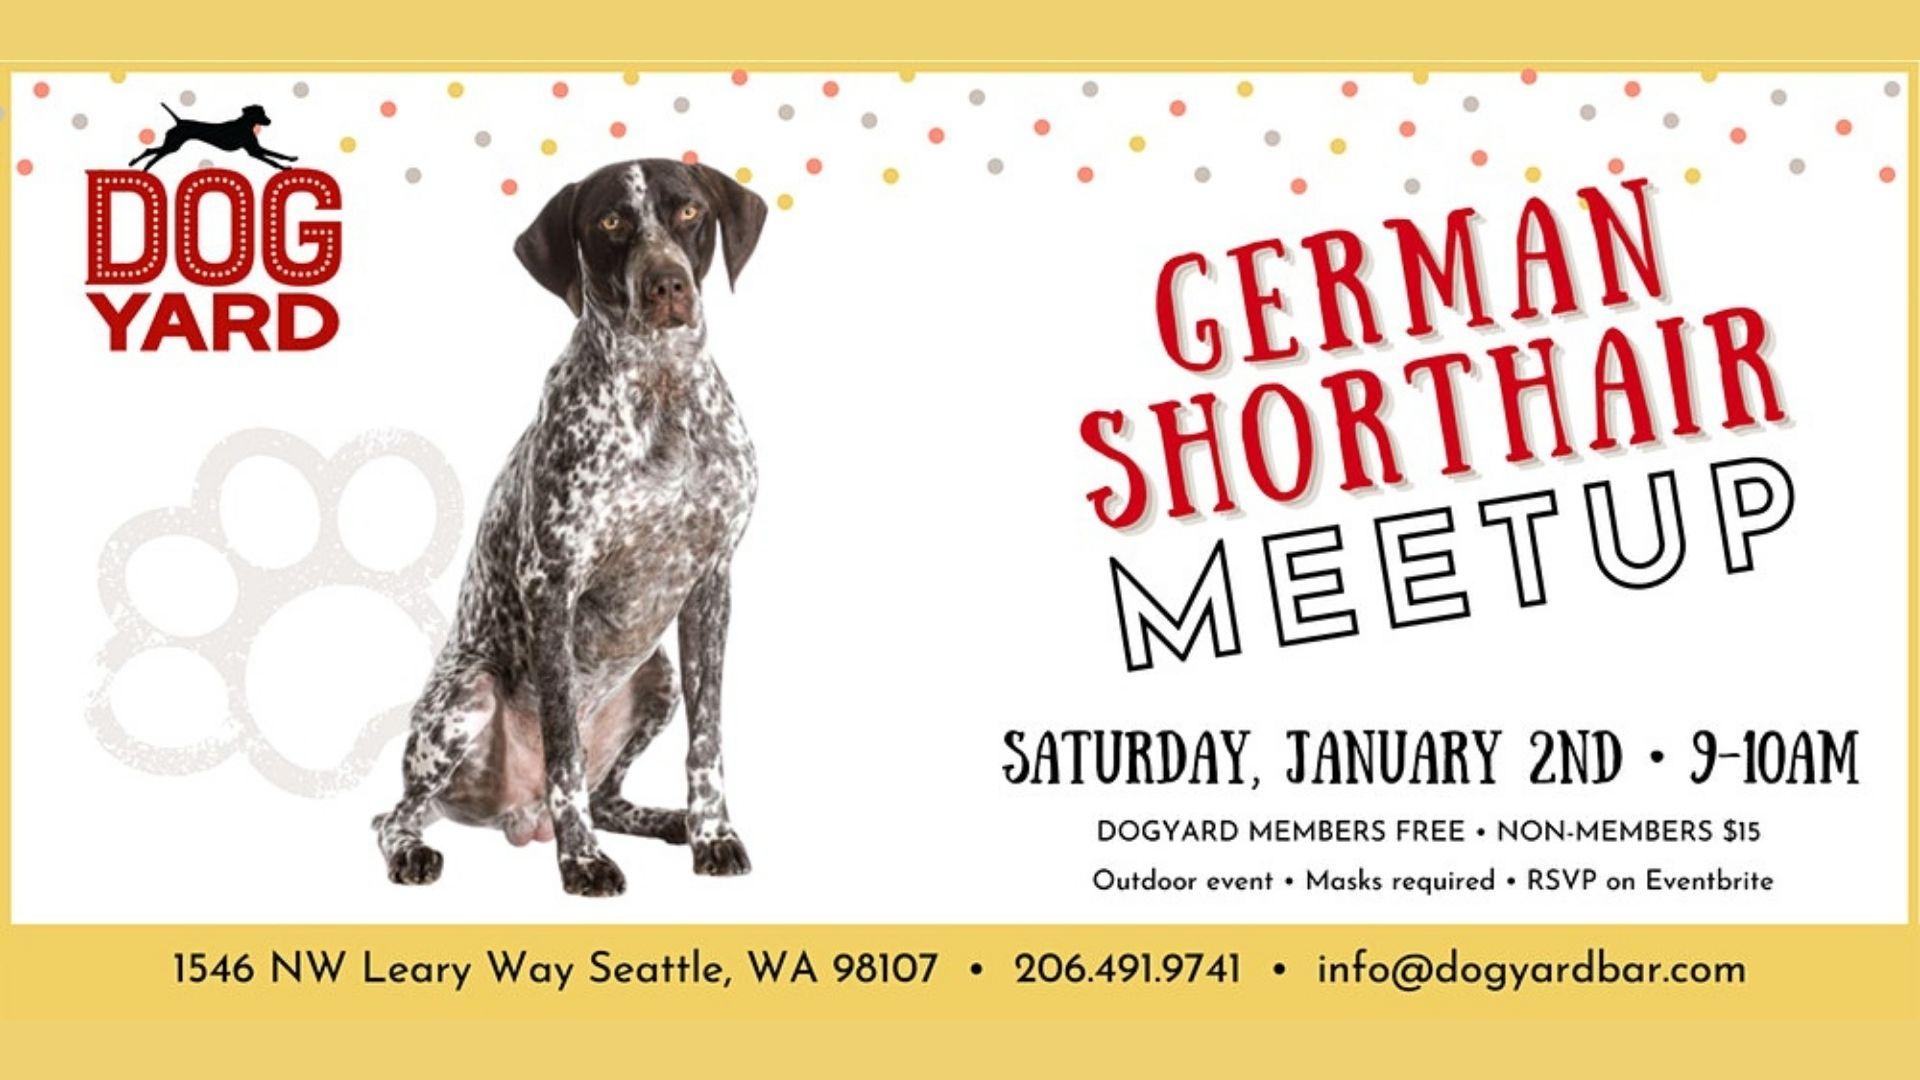 German Shorthair Meetup at the Dog Yard Sat Jan 2, 2021